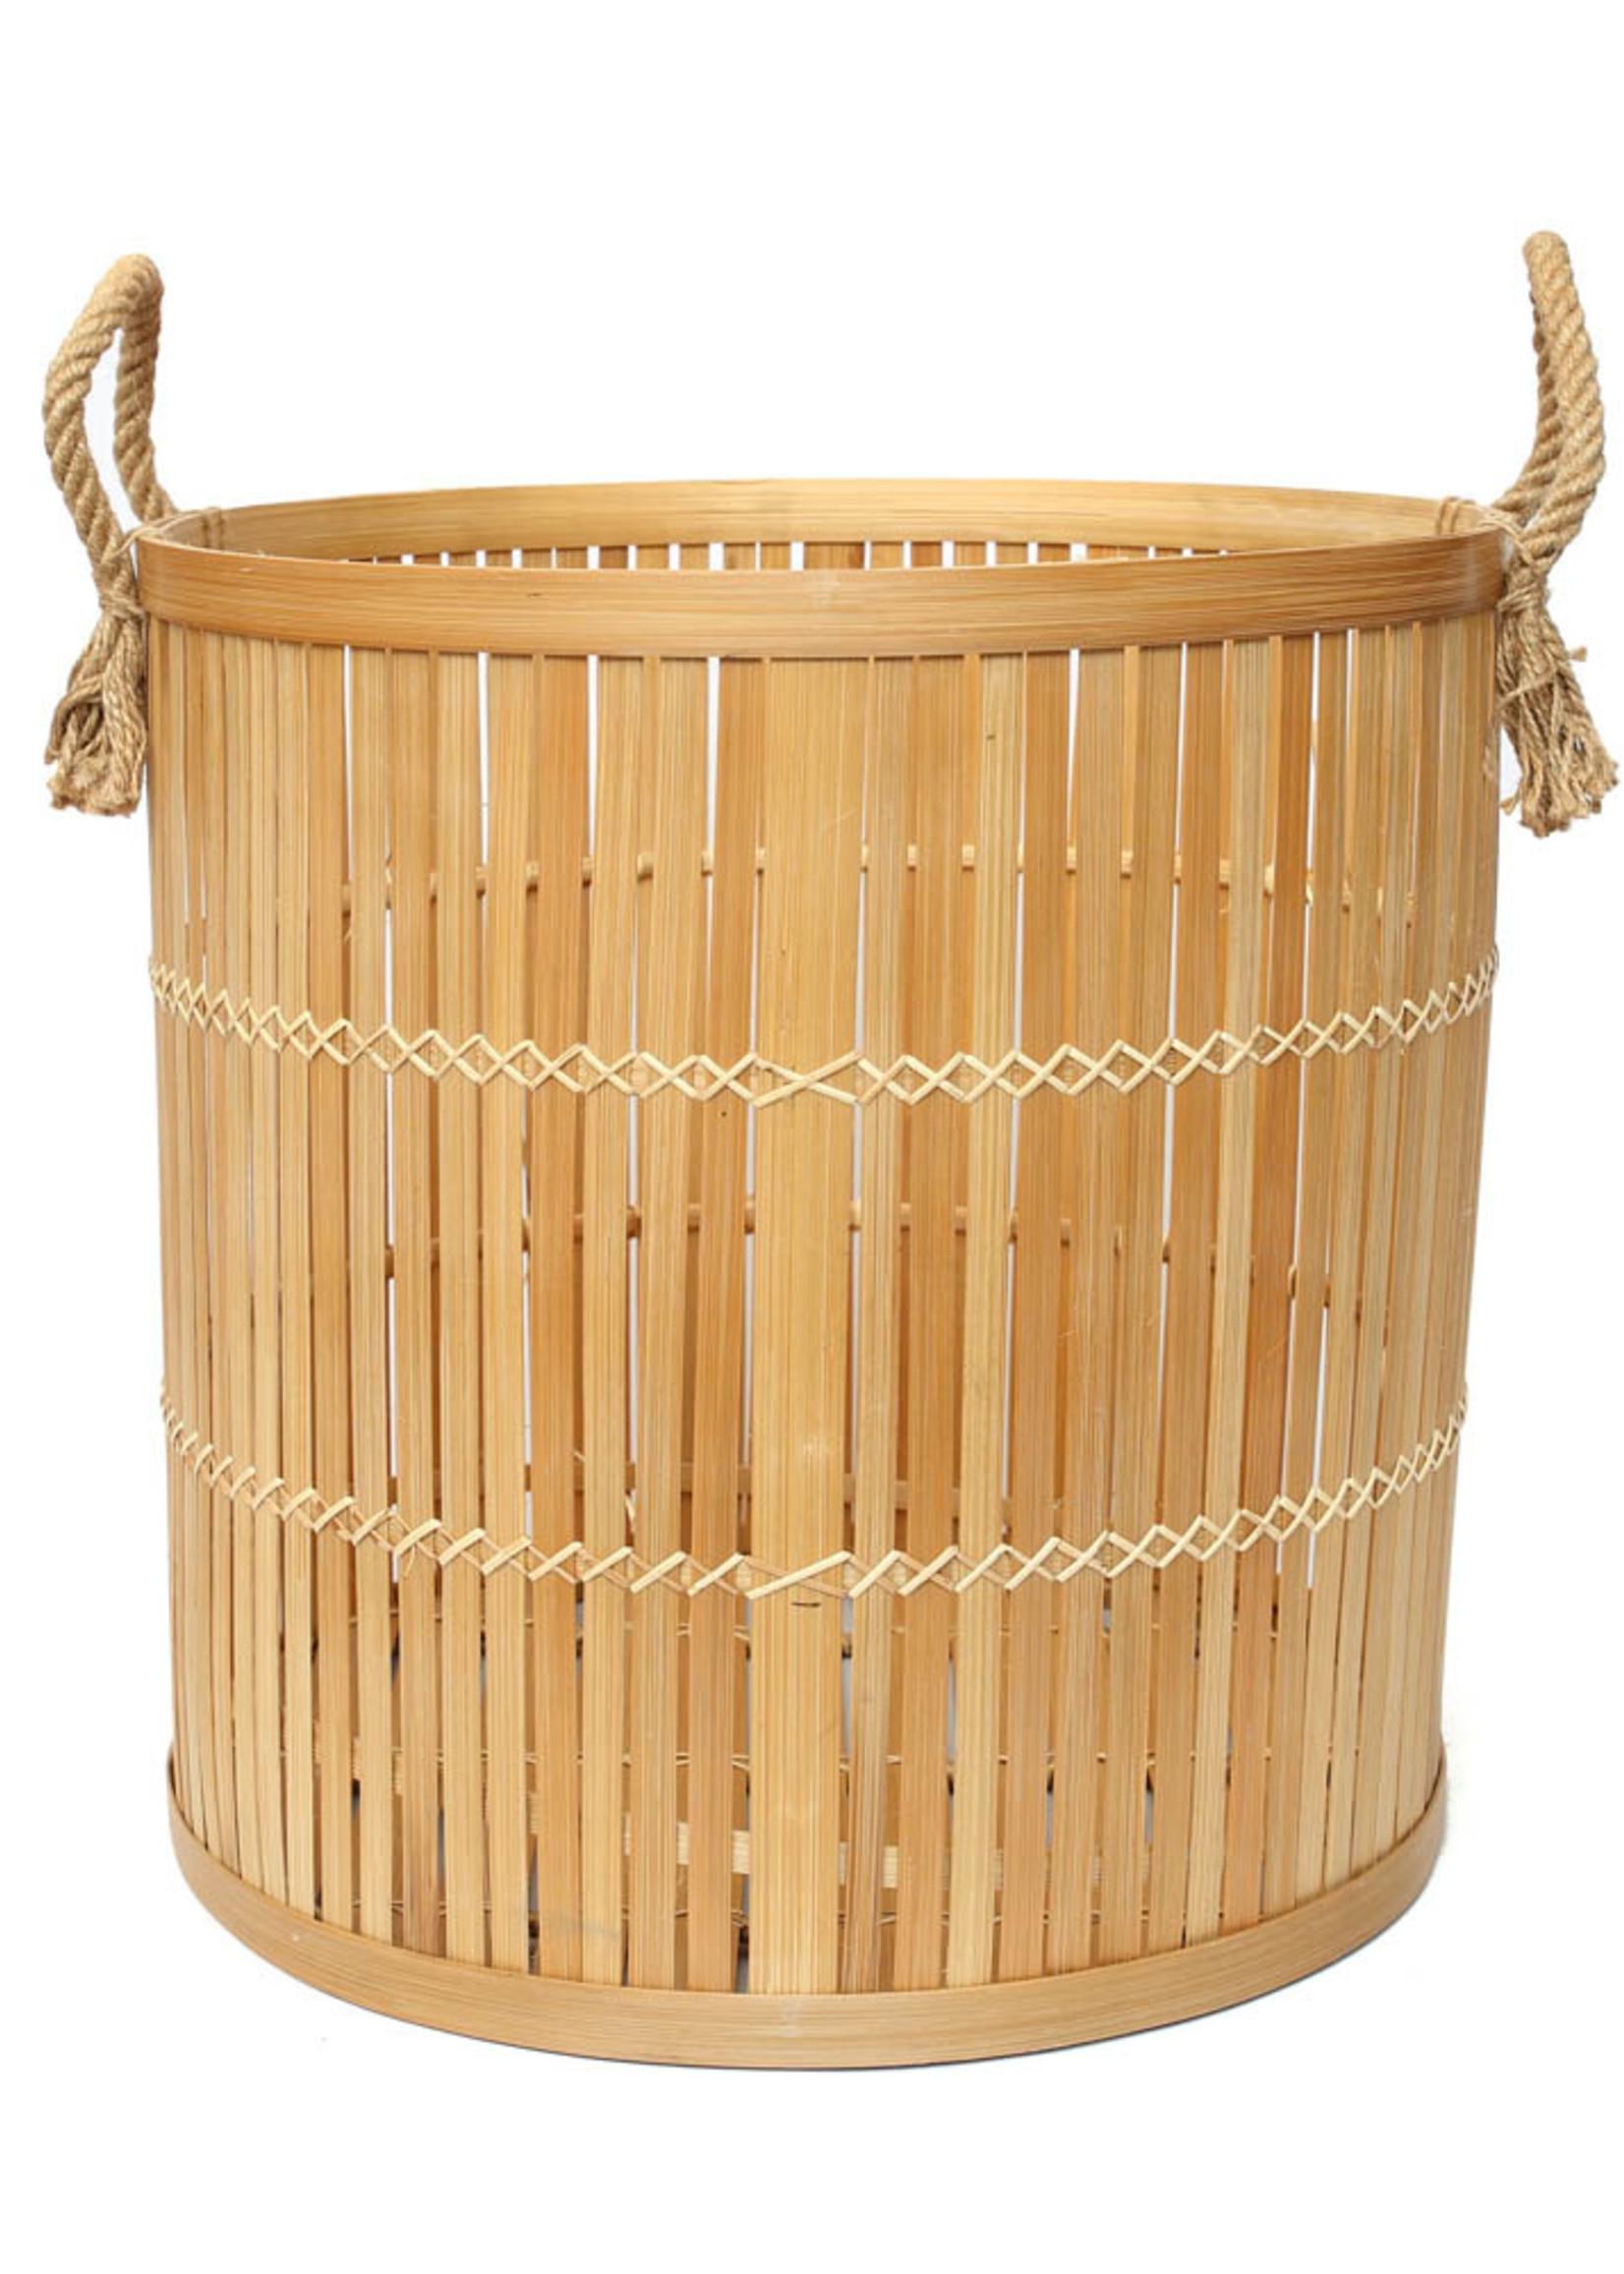 The Bamboo Baskets - Natural - Large